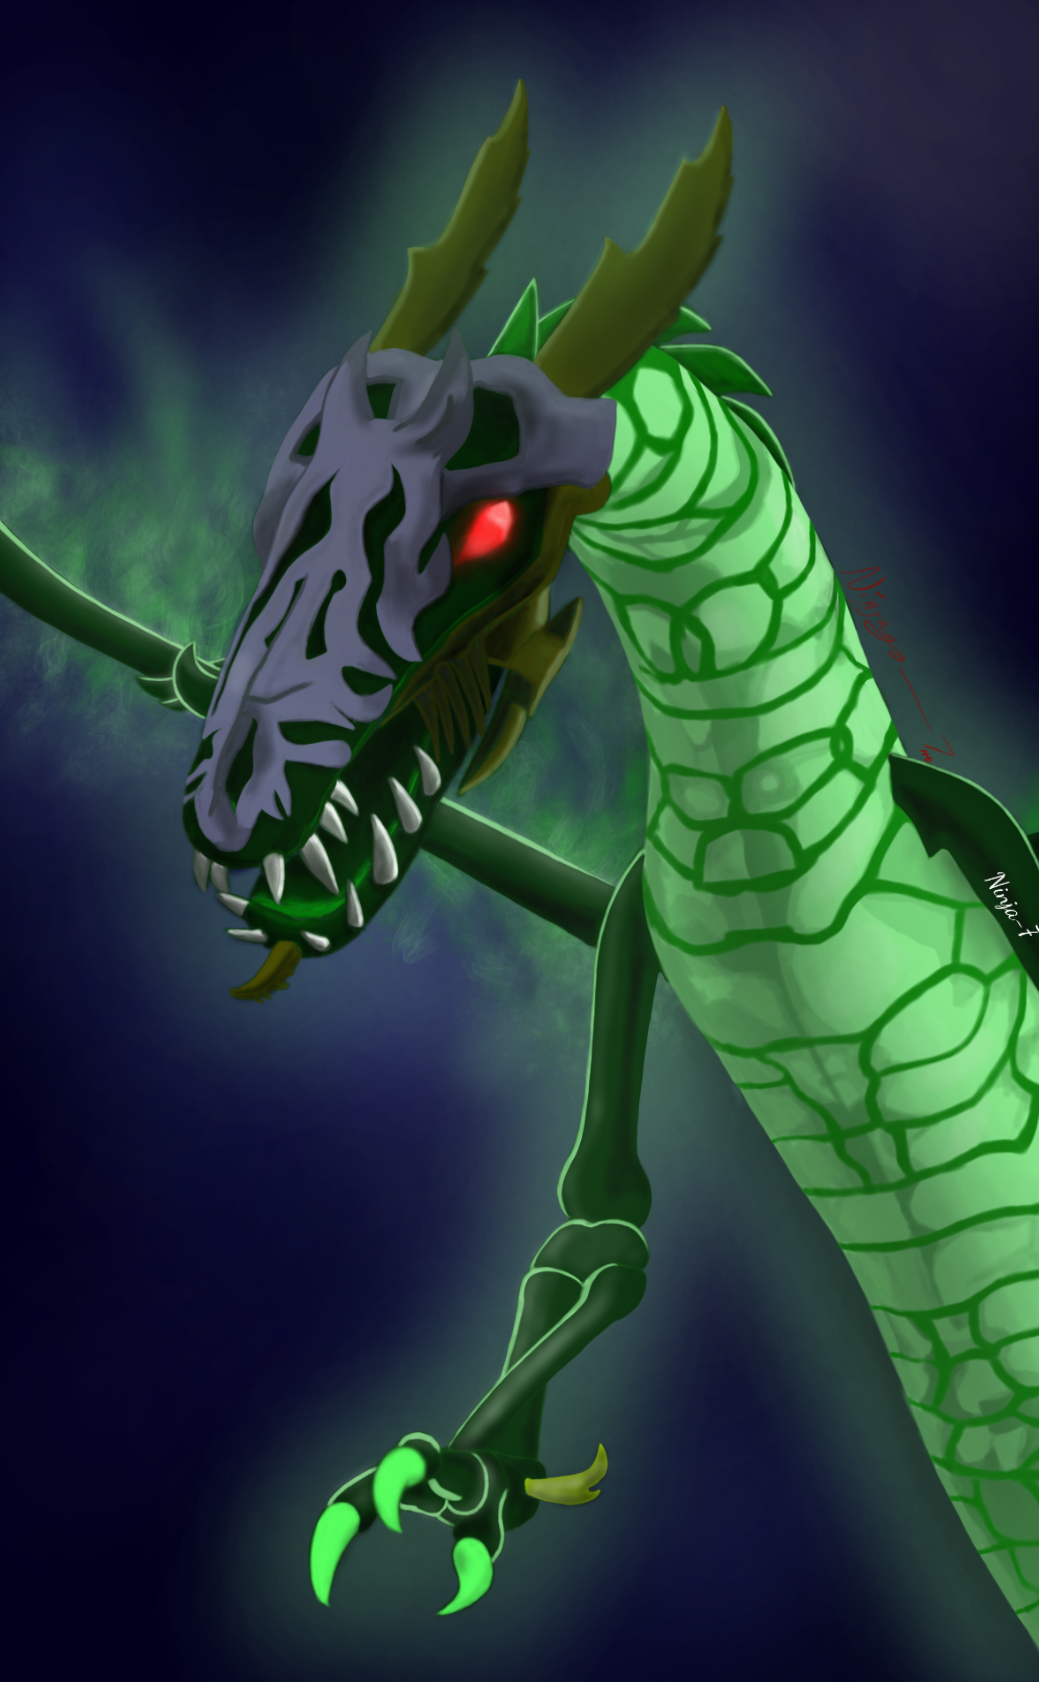 Elemental Wind Dragon Art By Ninja 7 Formerly Ninjago 7